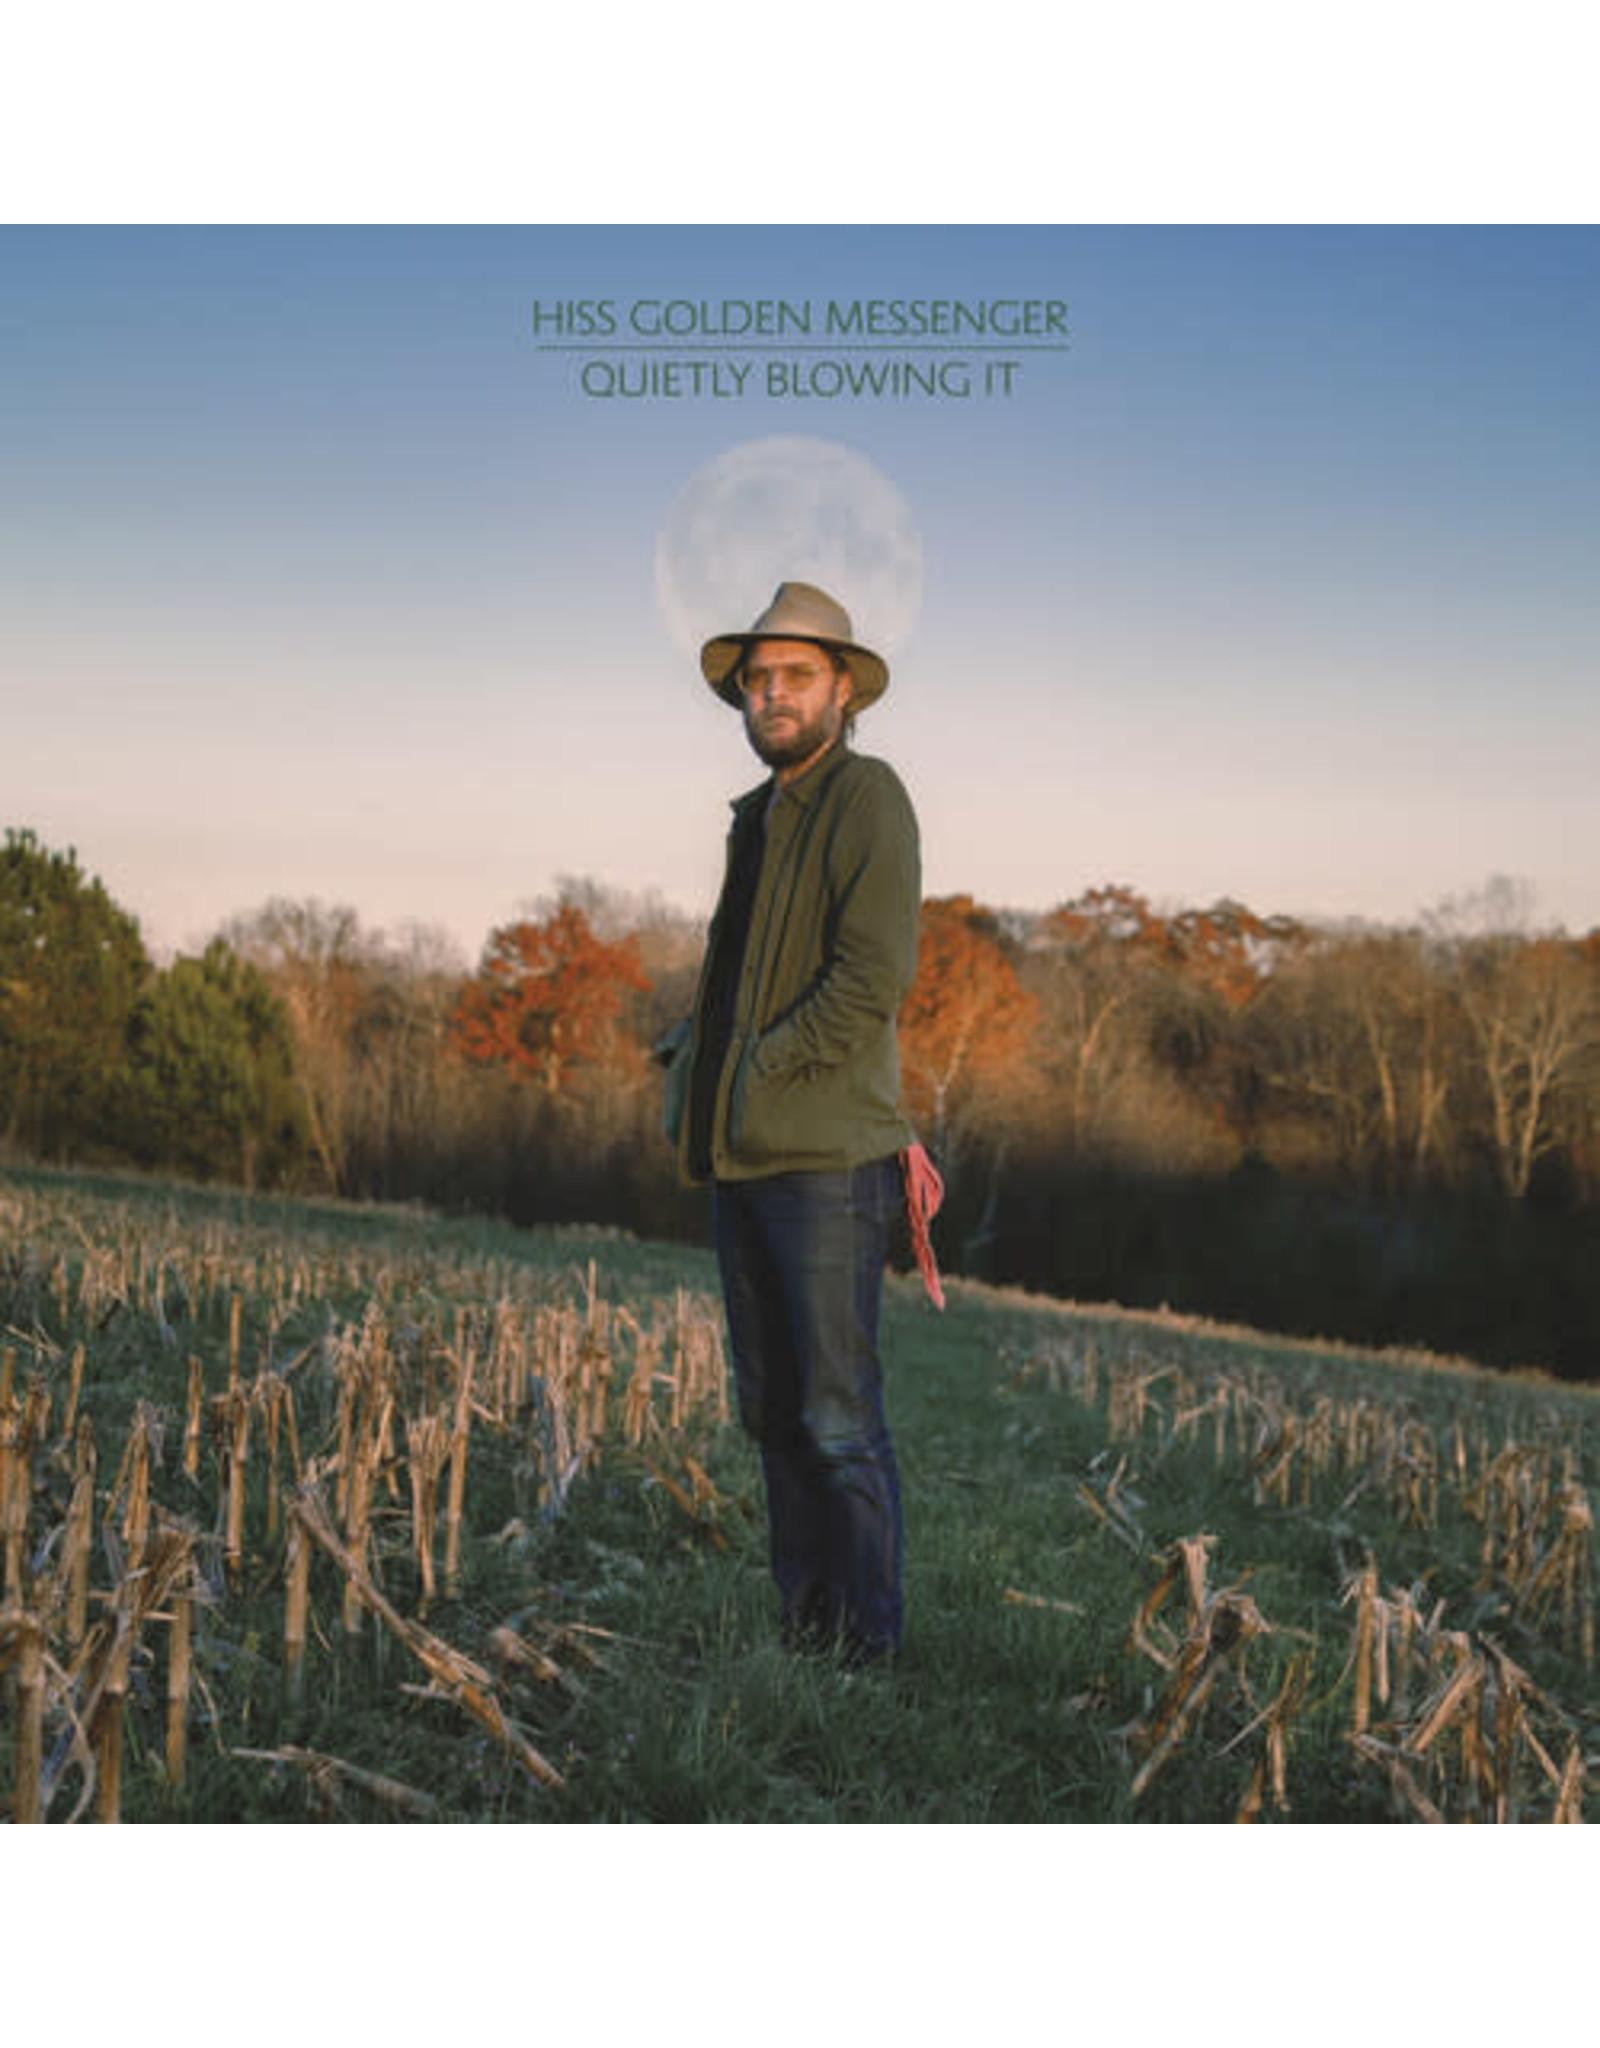 New Vinyl Hiss Golden Messenger - Quietly Blowing It LP